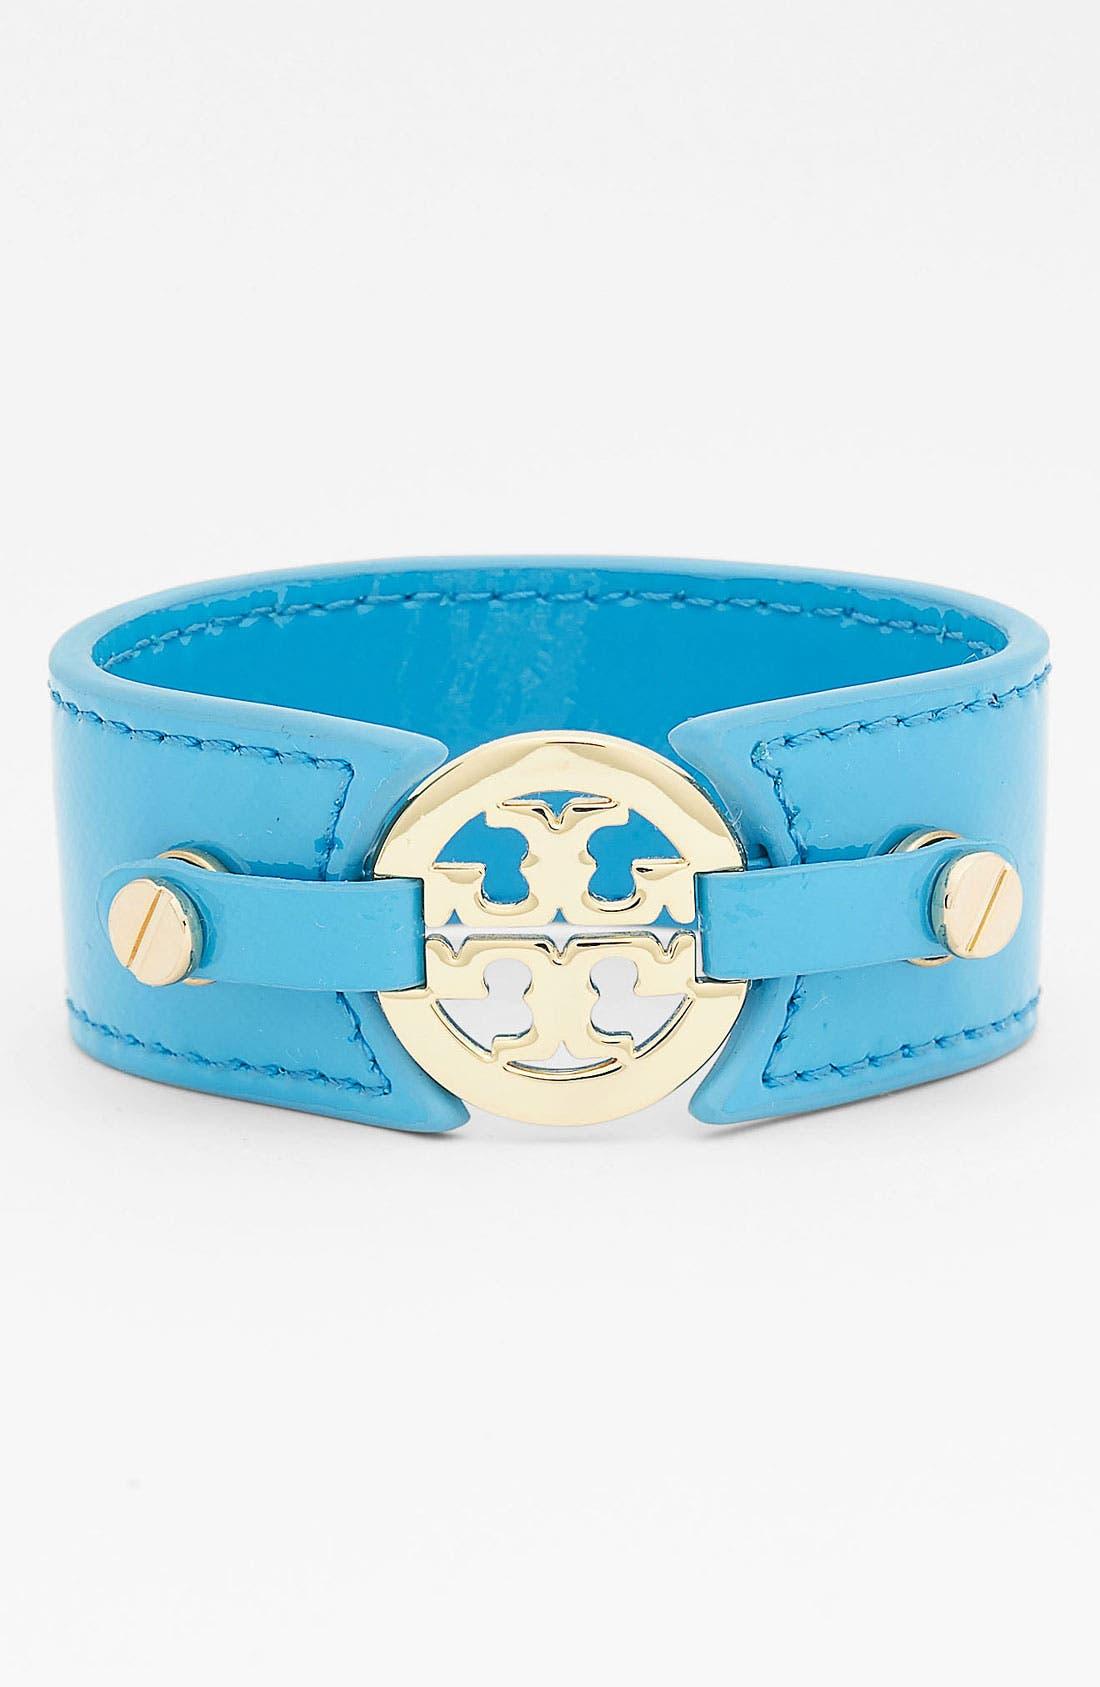 Main Image - Tory Burch Patent Leather Bracelet